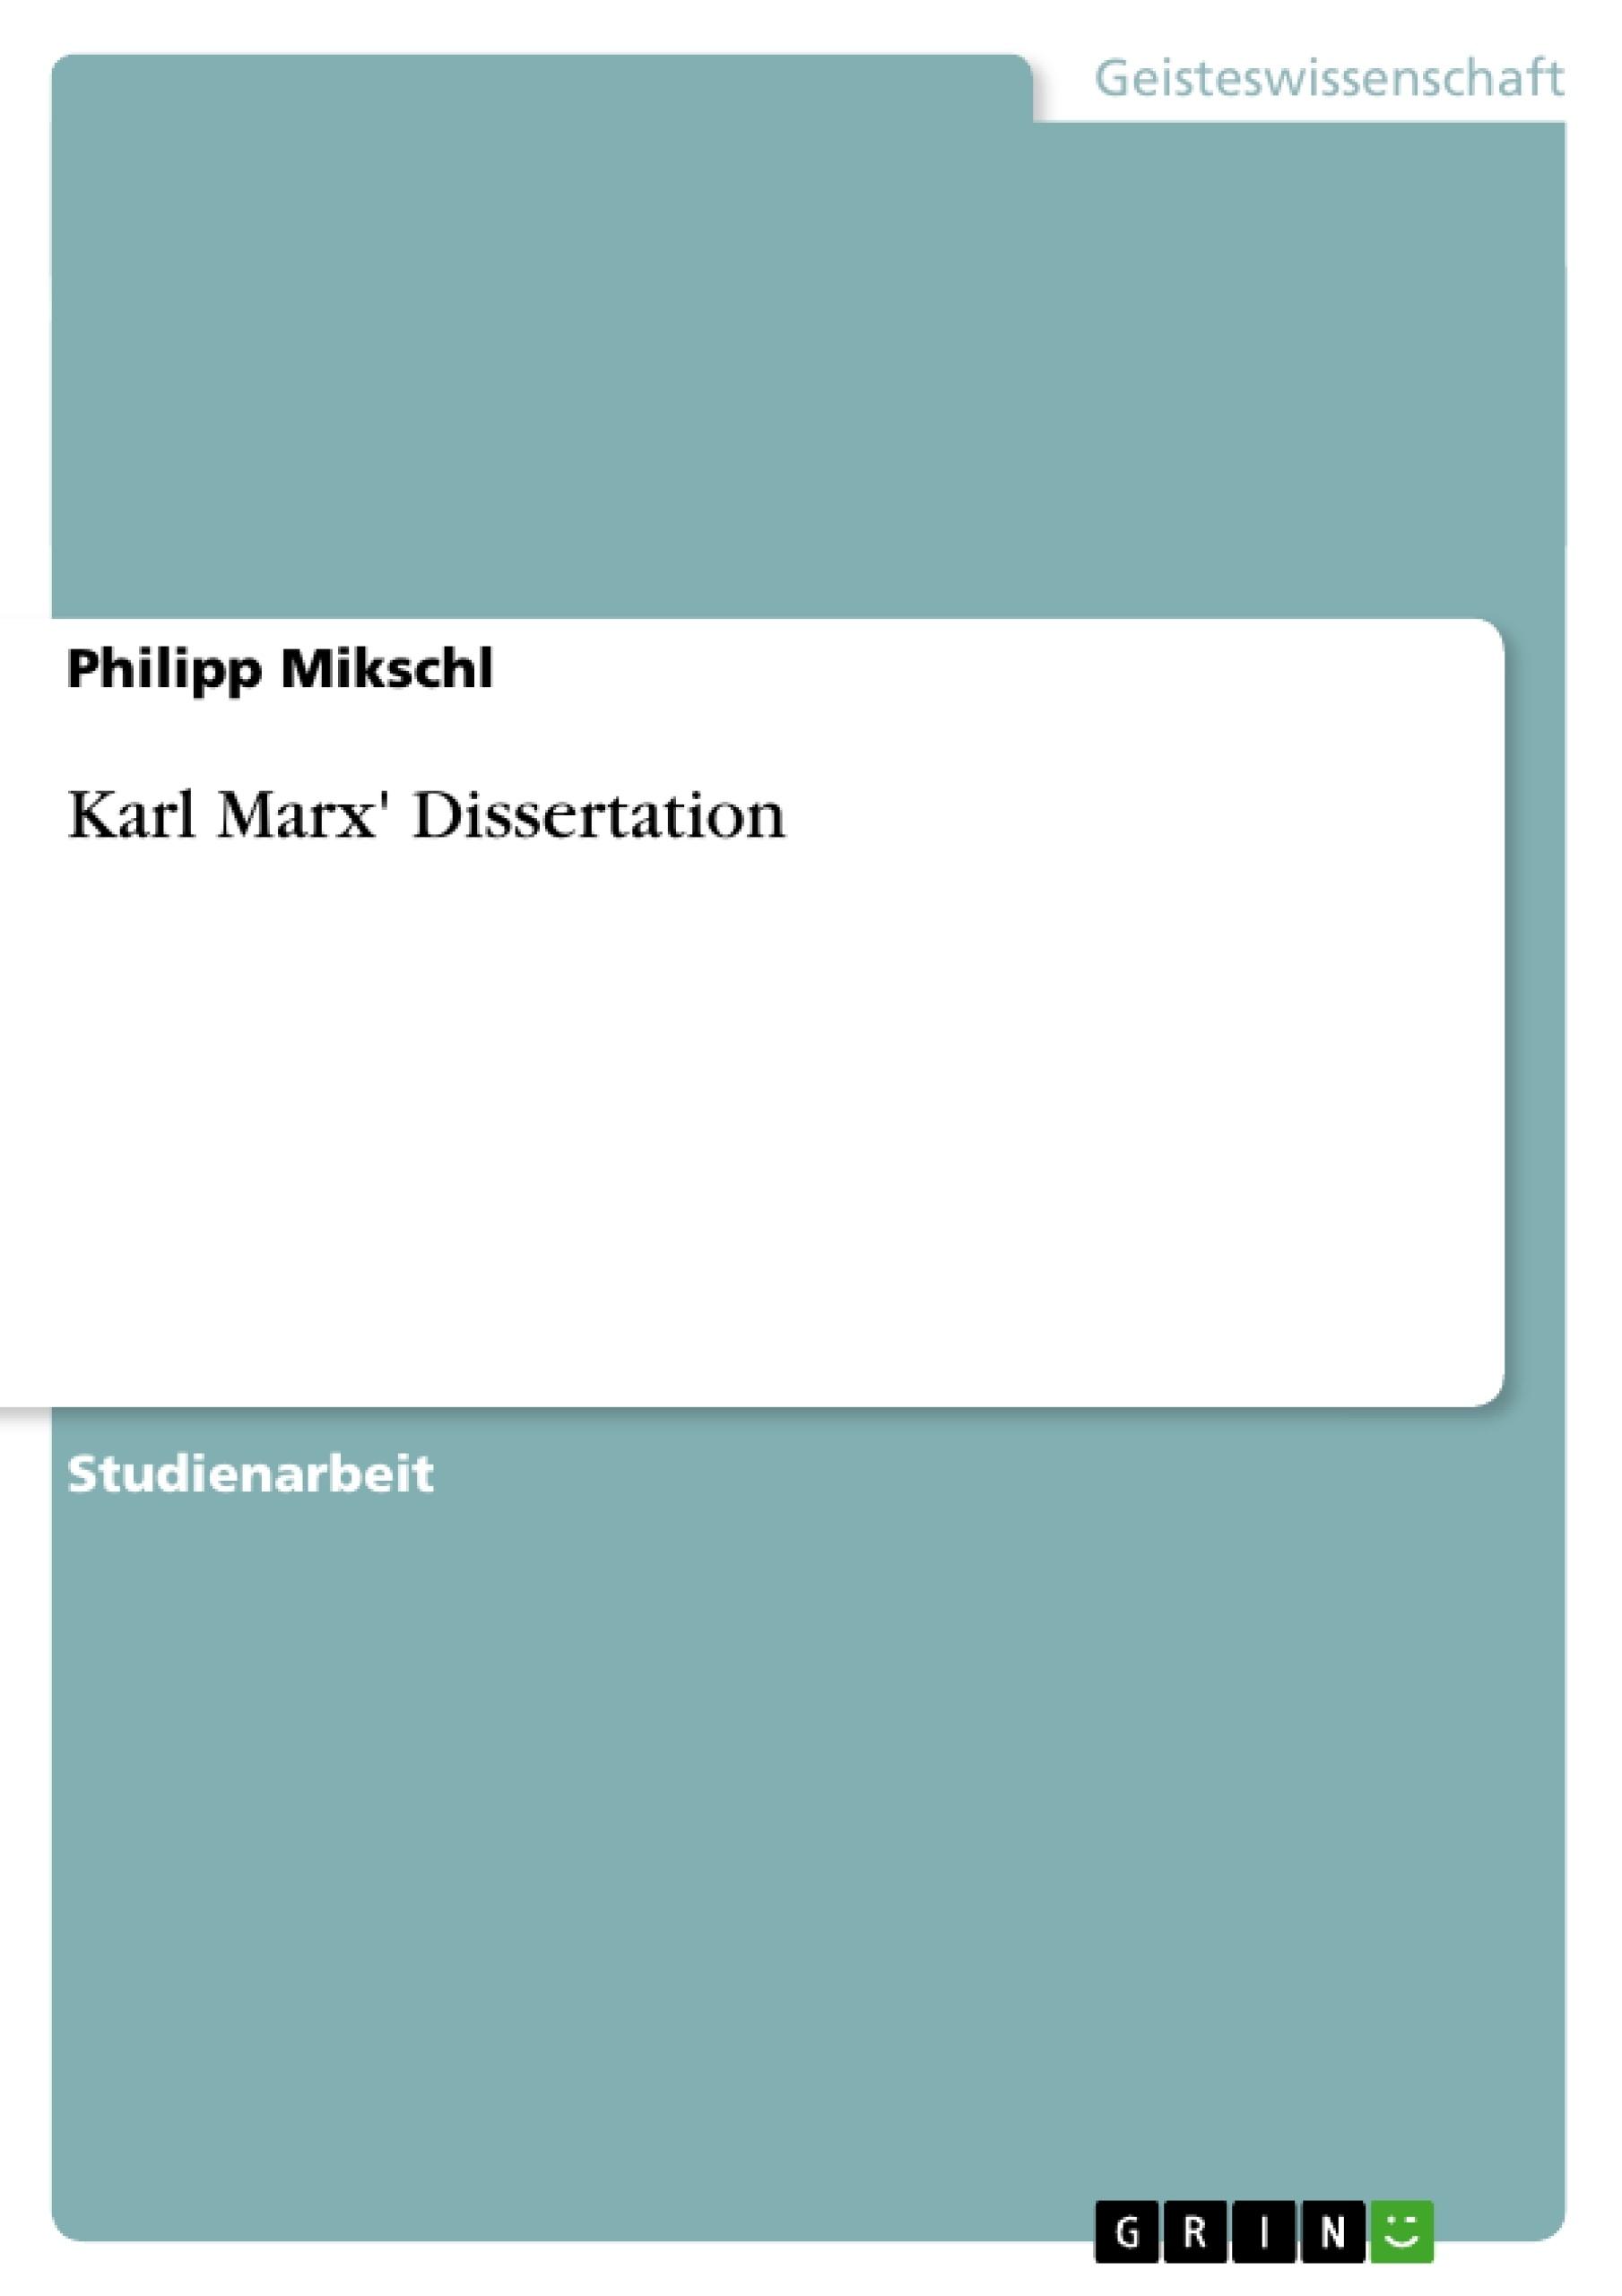 Titel: Karl Marx' Dissertation